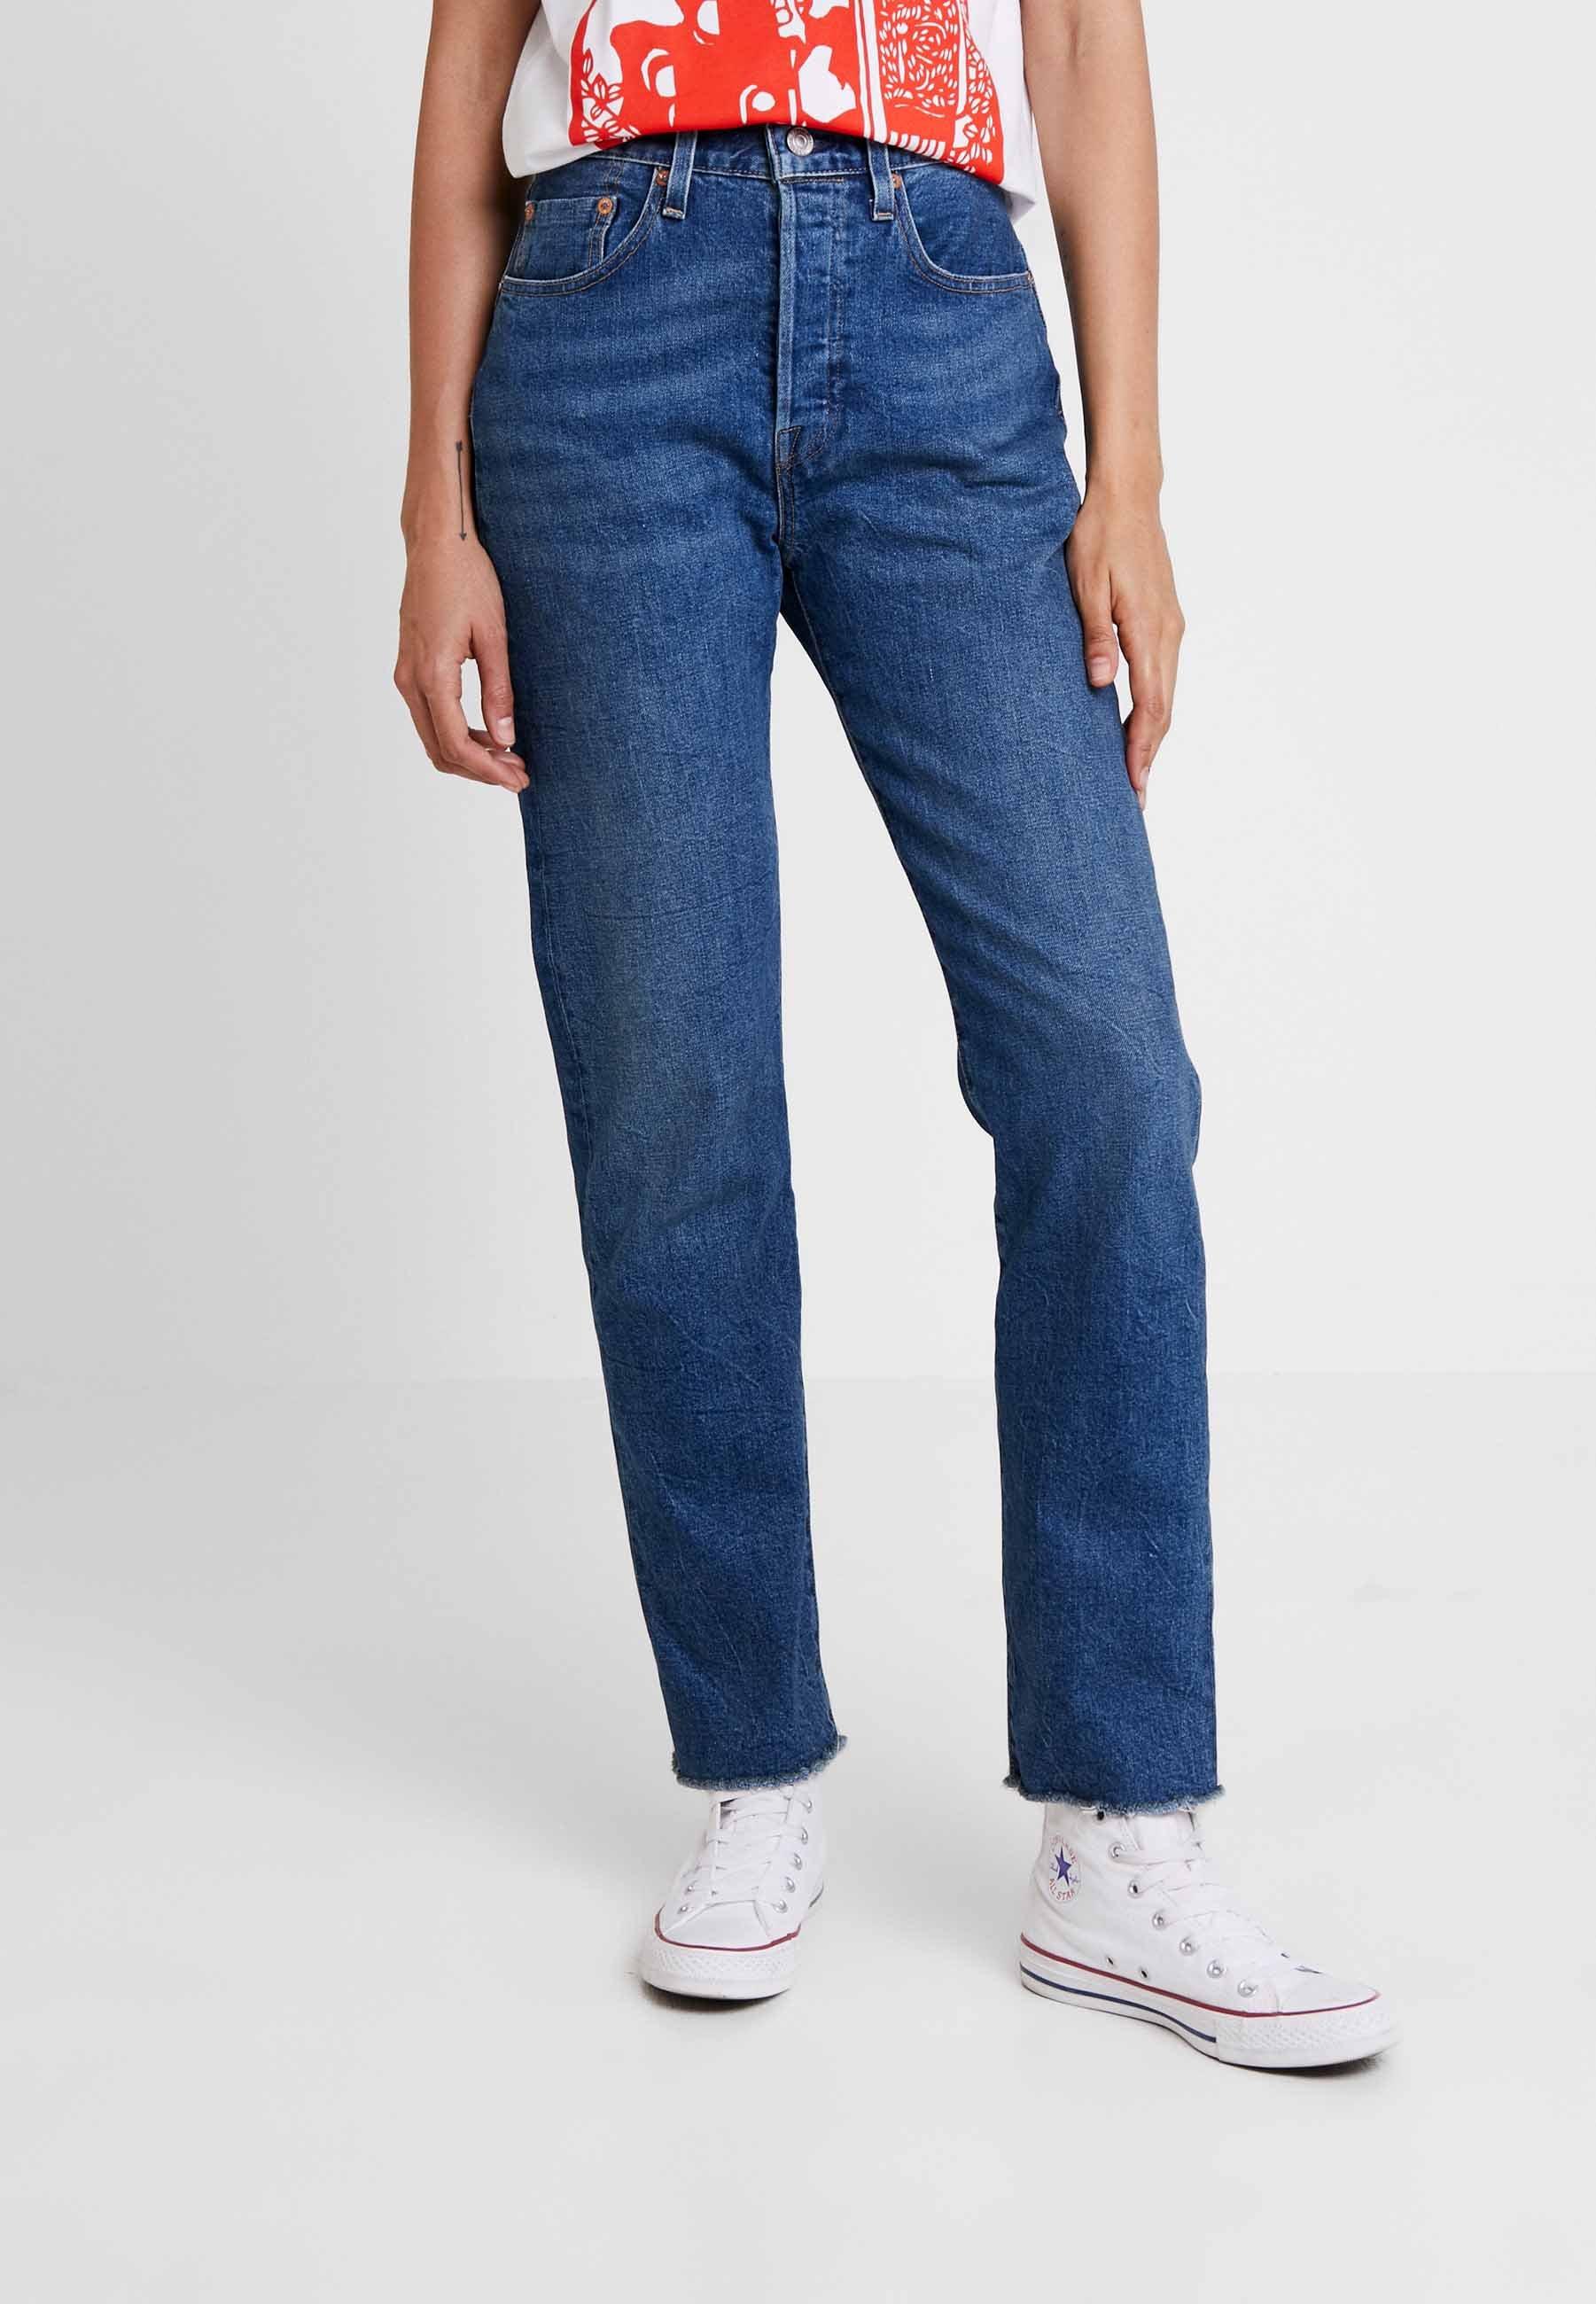 501Jean Blue Levi's® Madeamp; Crafted Boots Slim lF1cTKJ